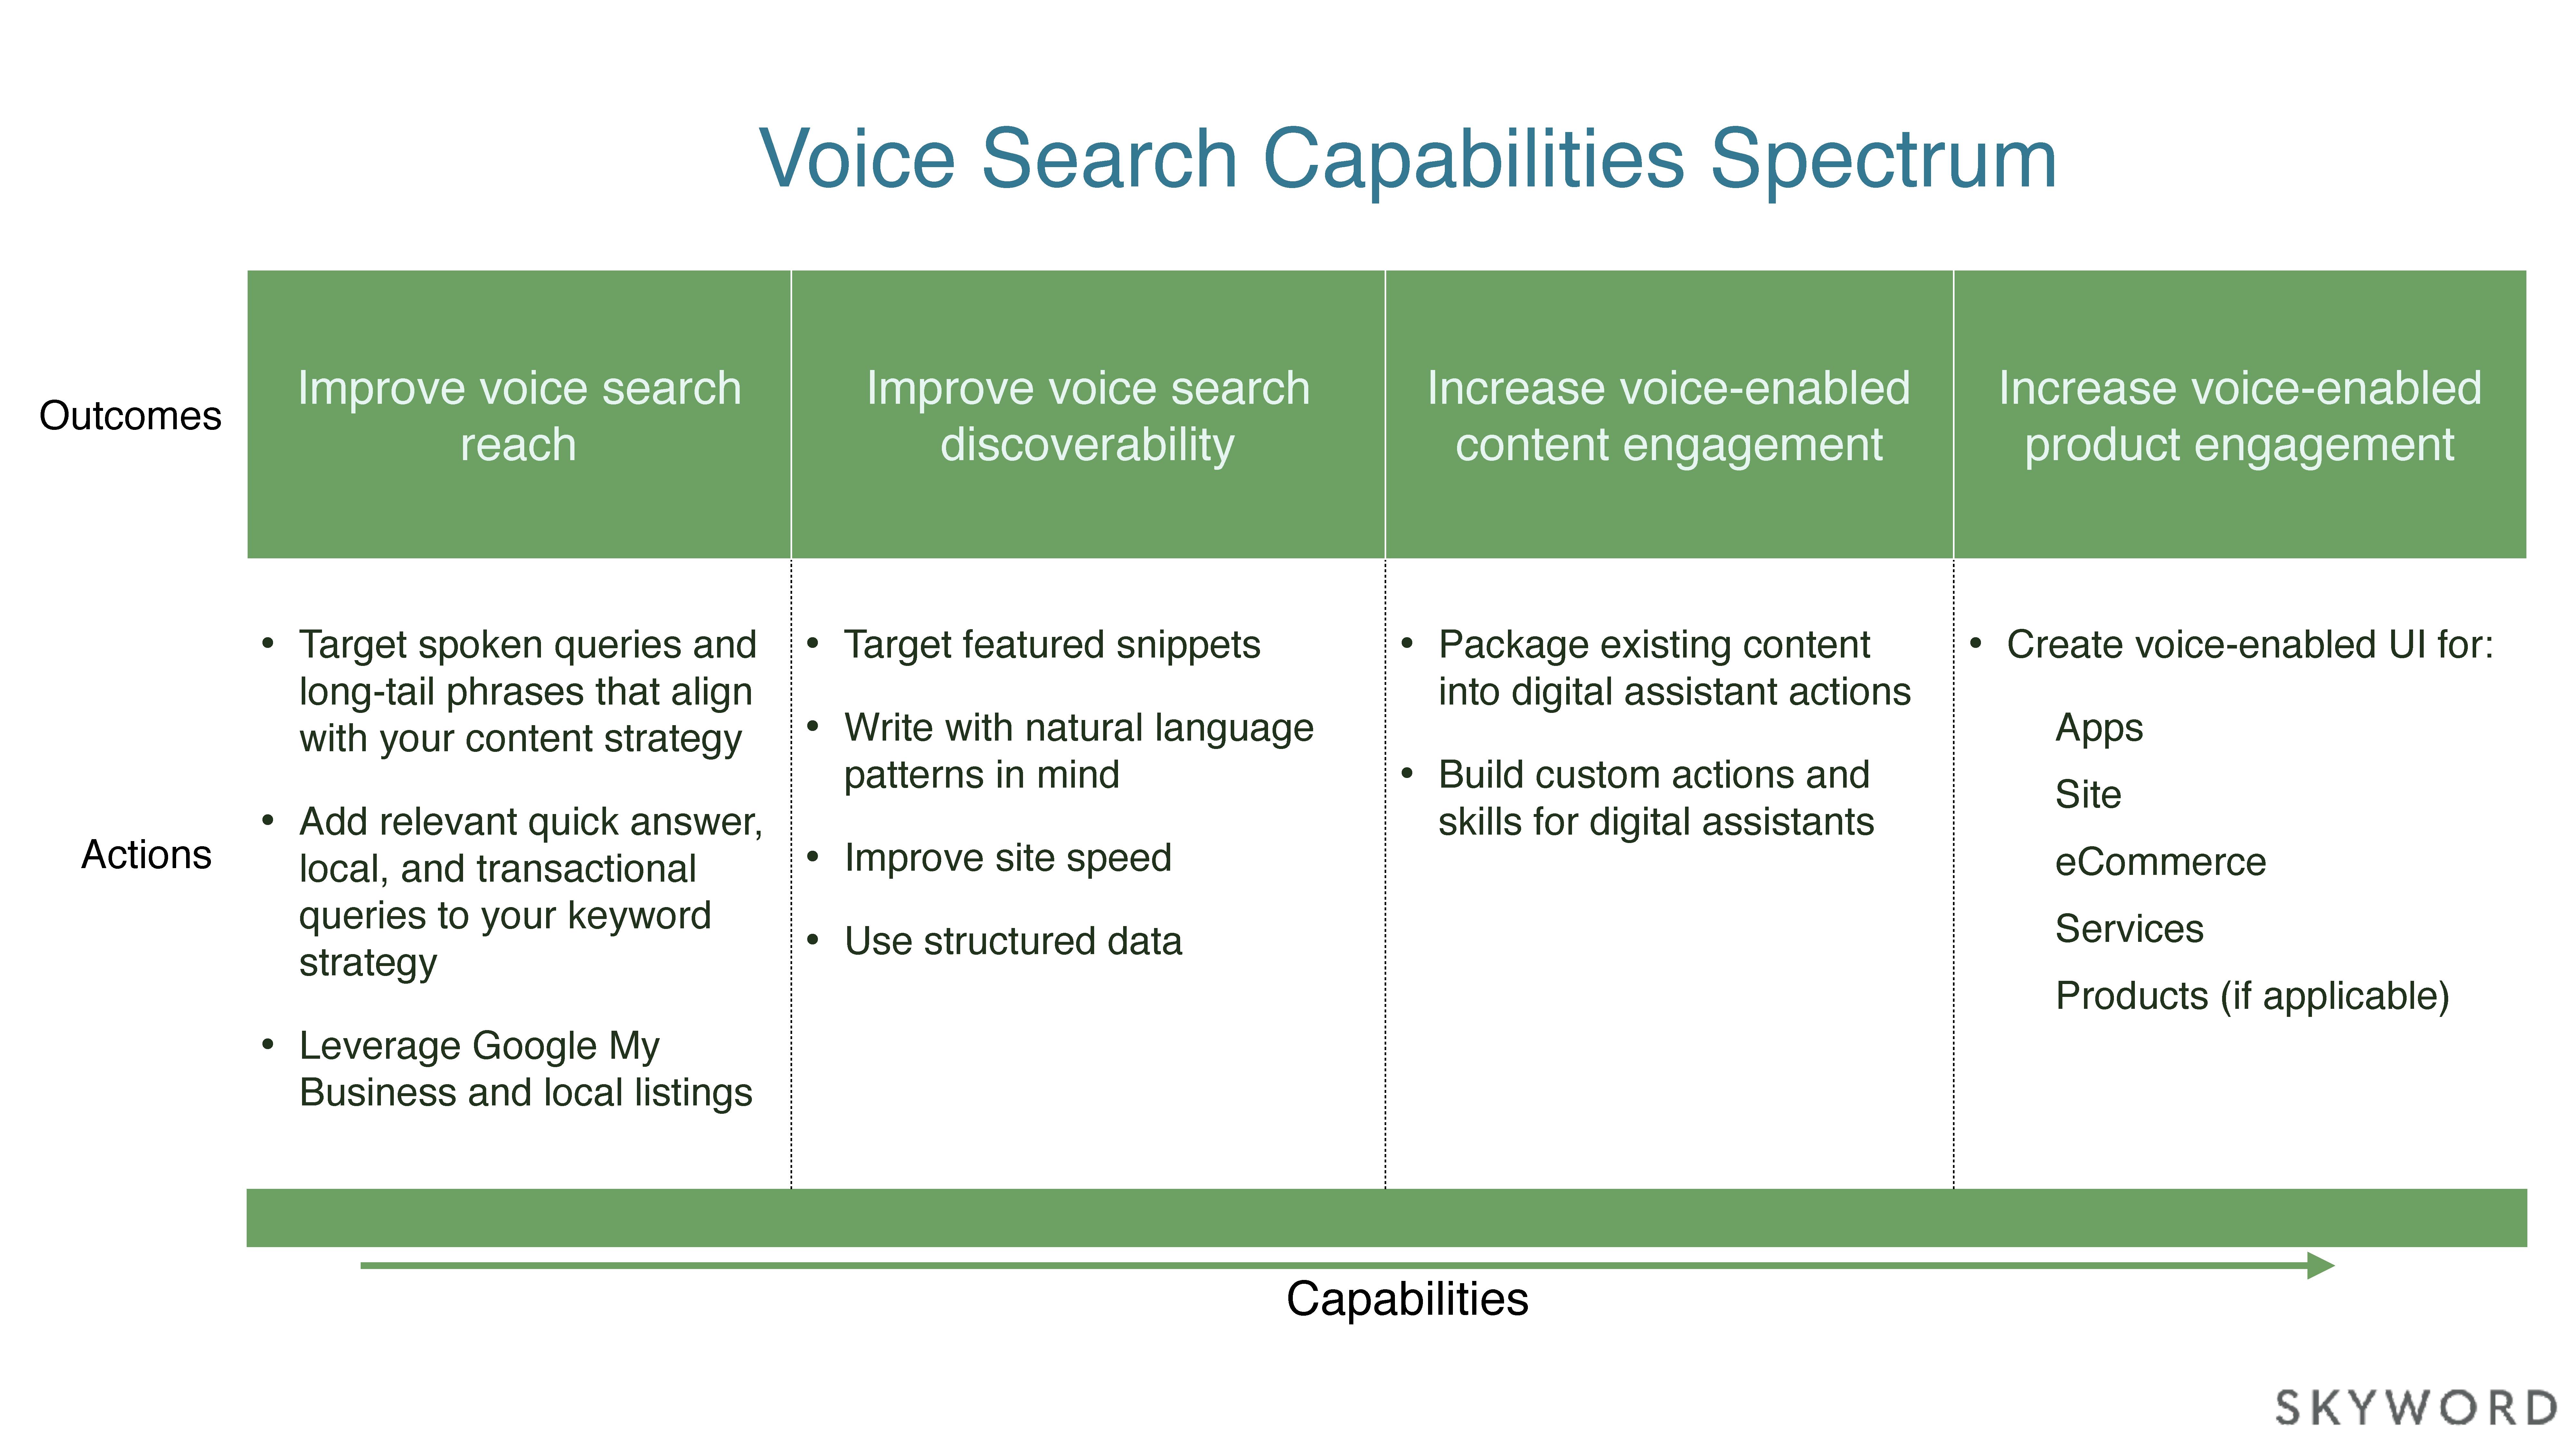 Skyword Voice Search Capabilities Spectrum